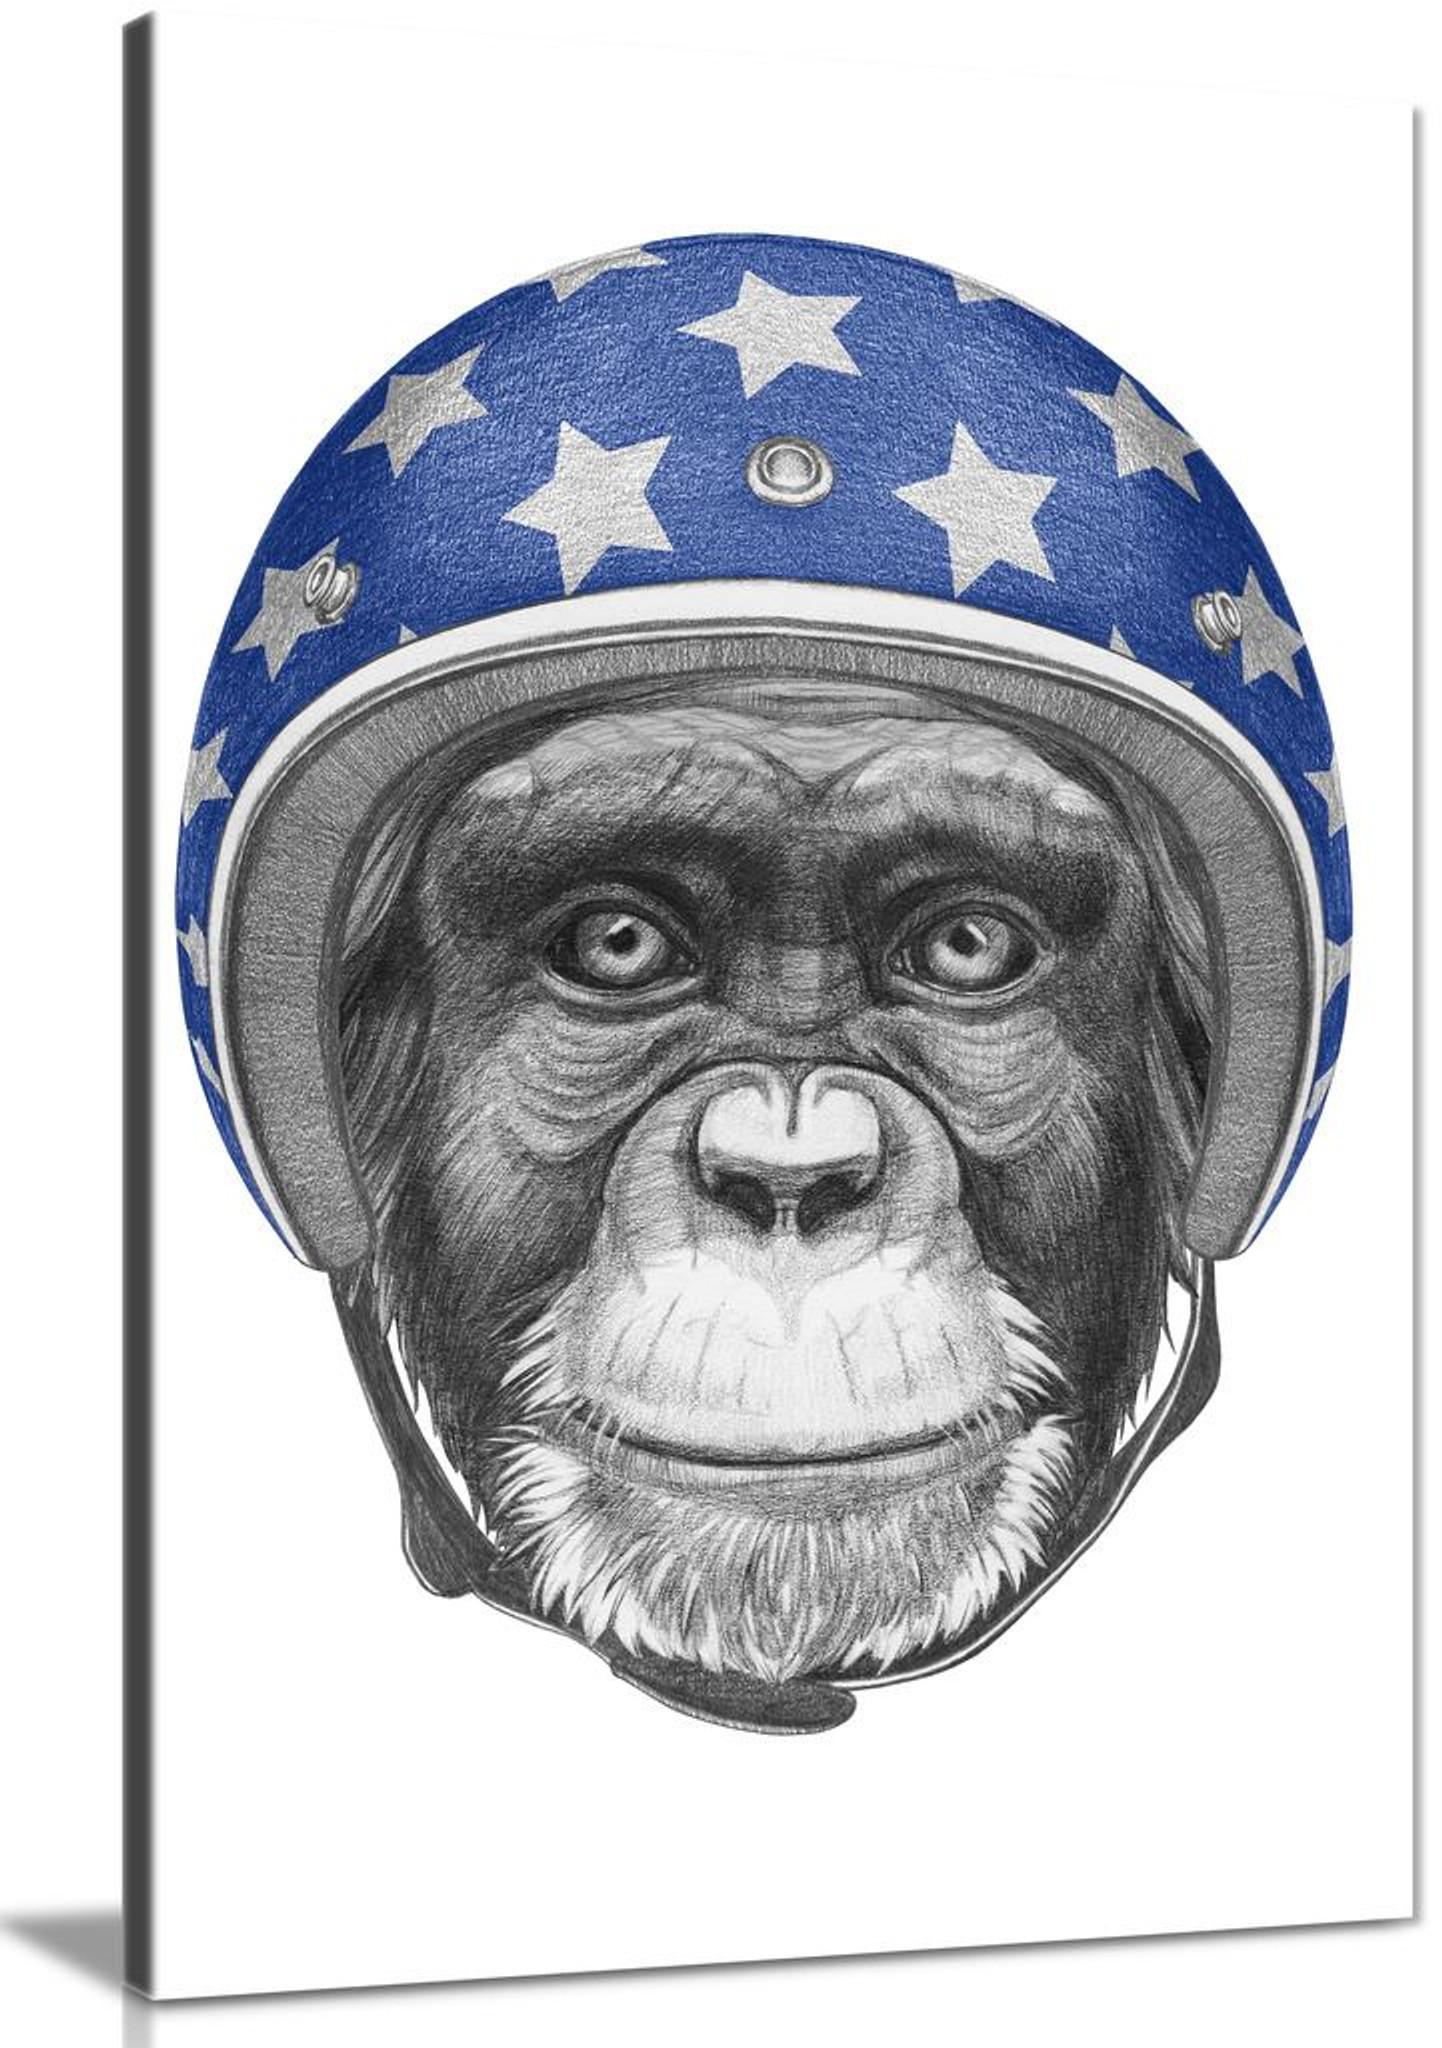 Modern Contemporary Monkey Drawing Pop Art Canvas